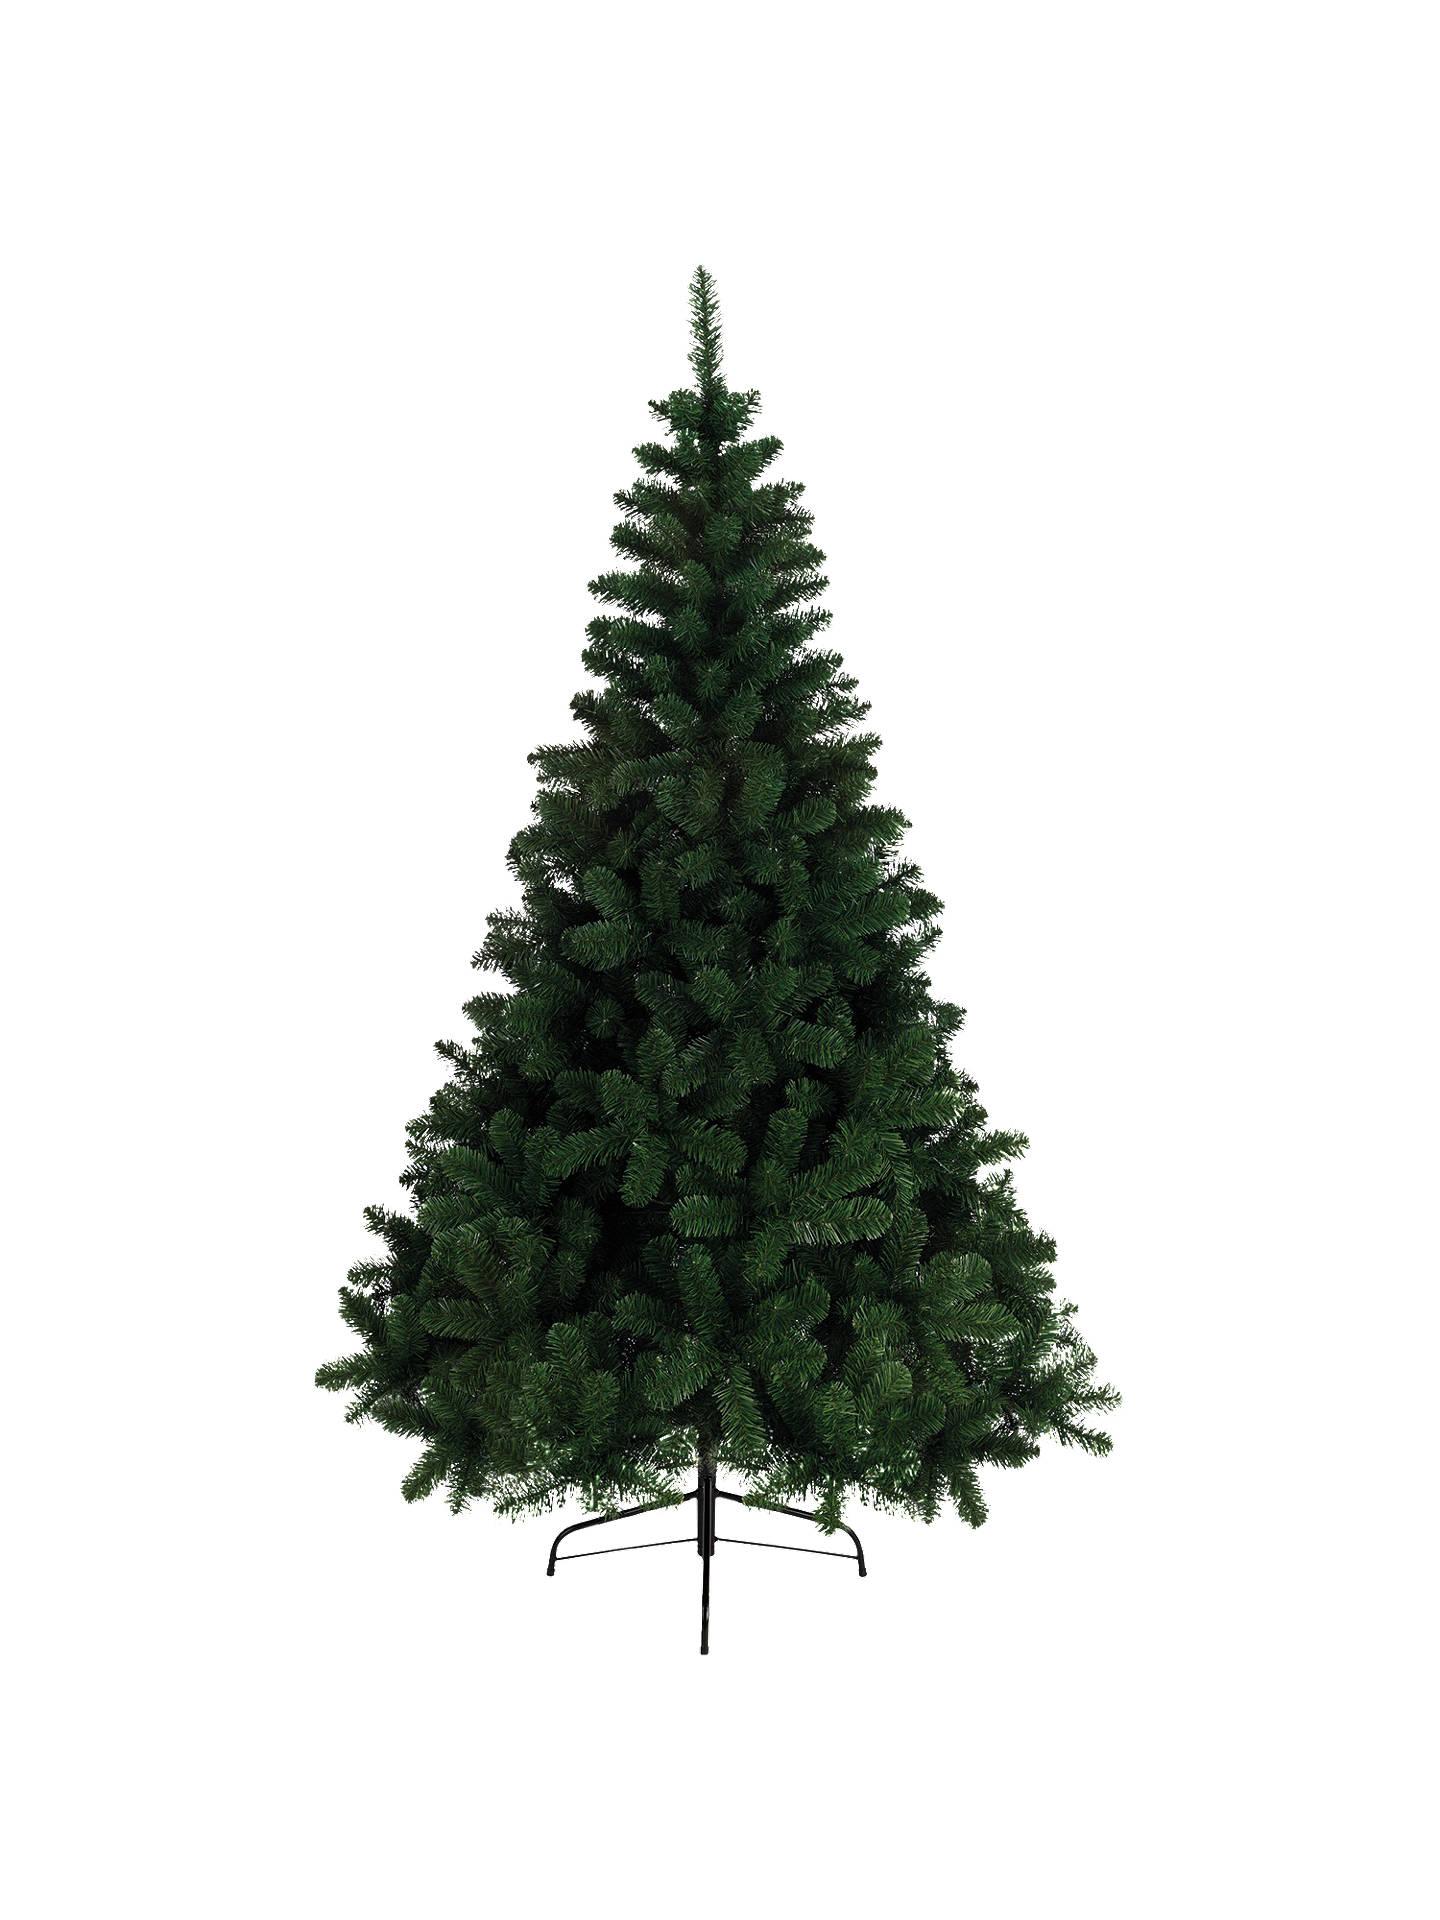 15 Ft Christmas Tree.John Lewis Imperial Fir Christmas Tree 15ft At John Lewis